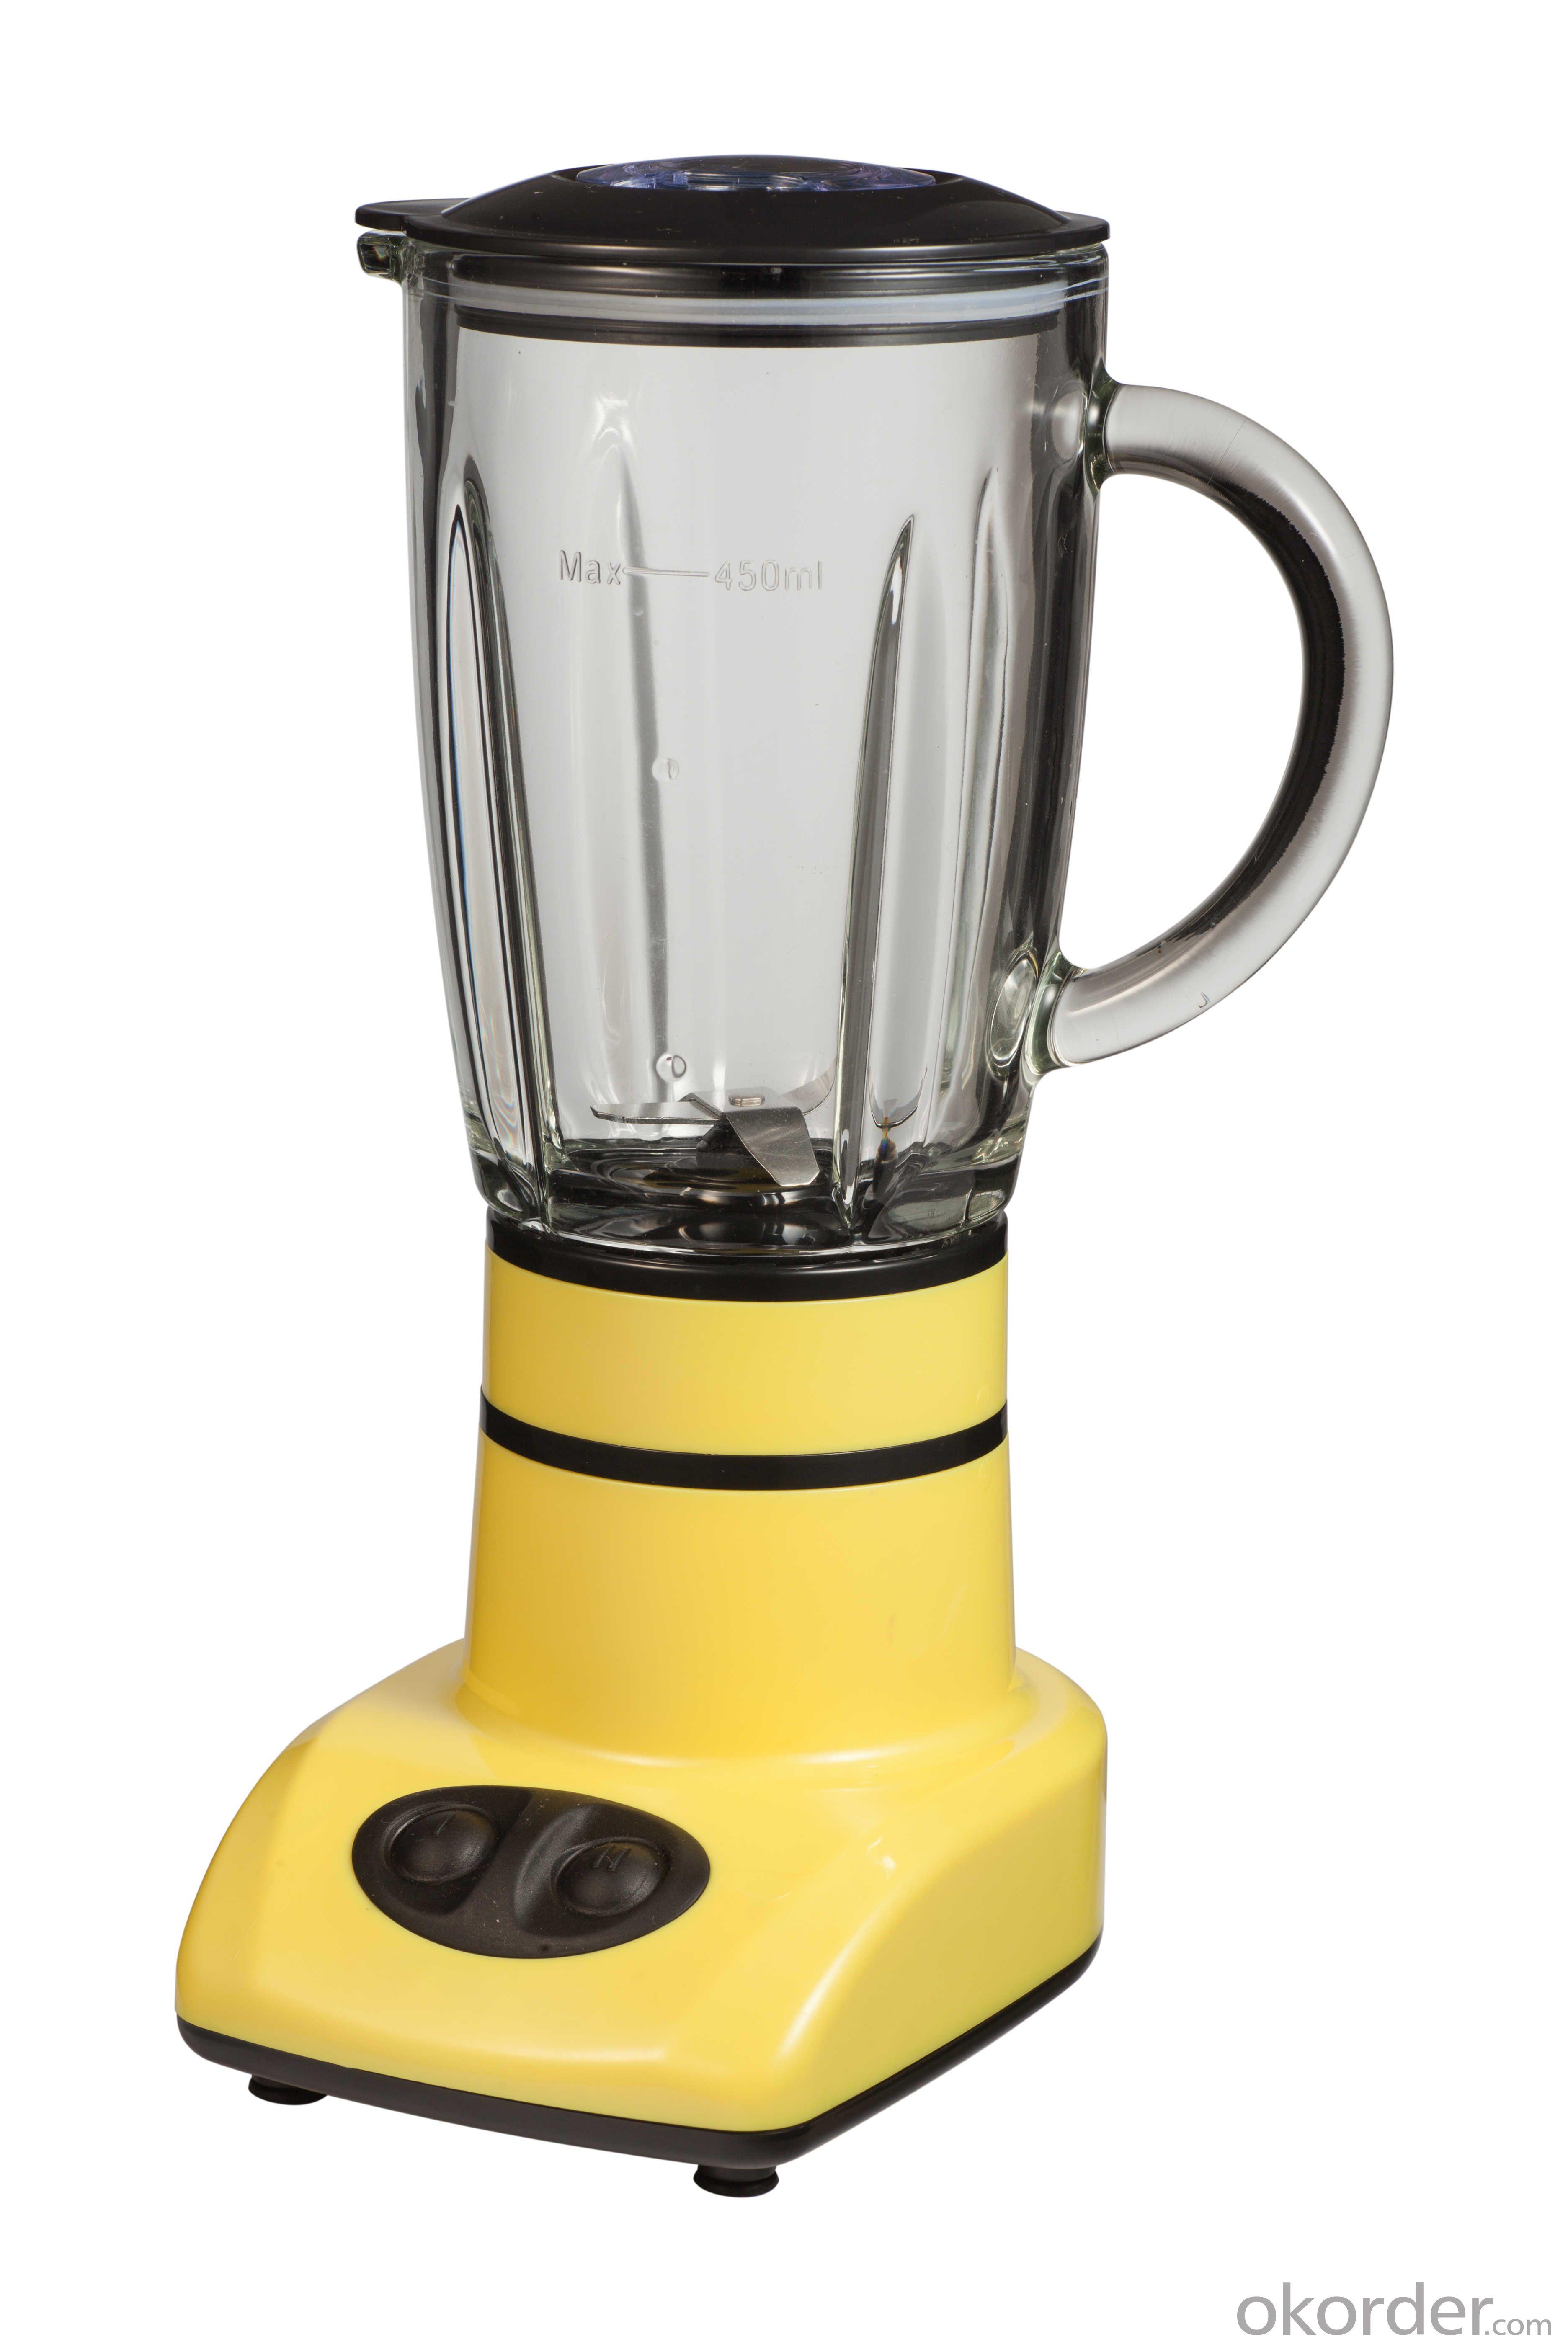 Two speeds and glass jar blender DZ-2009G